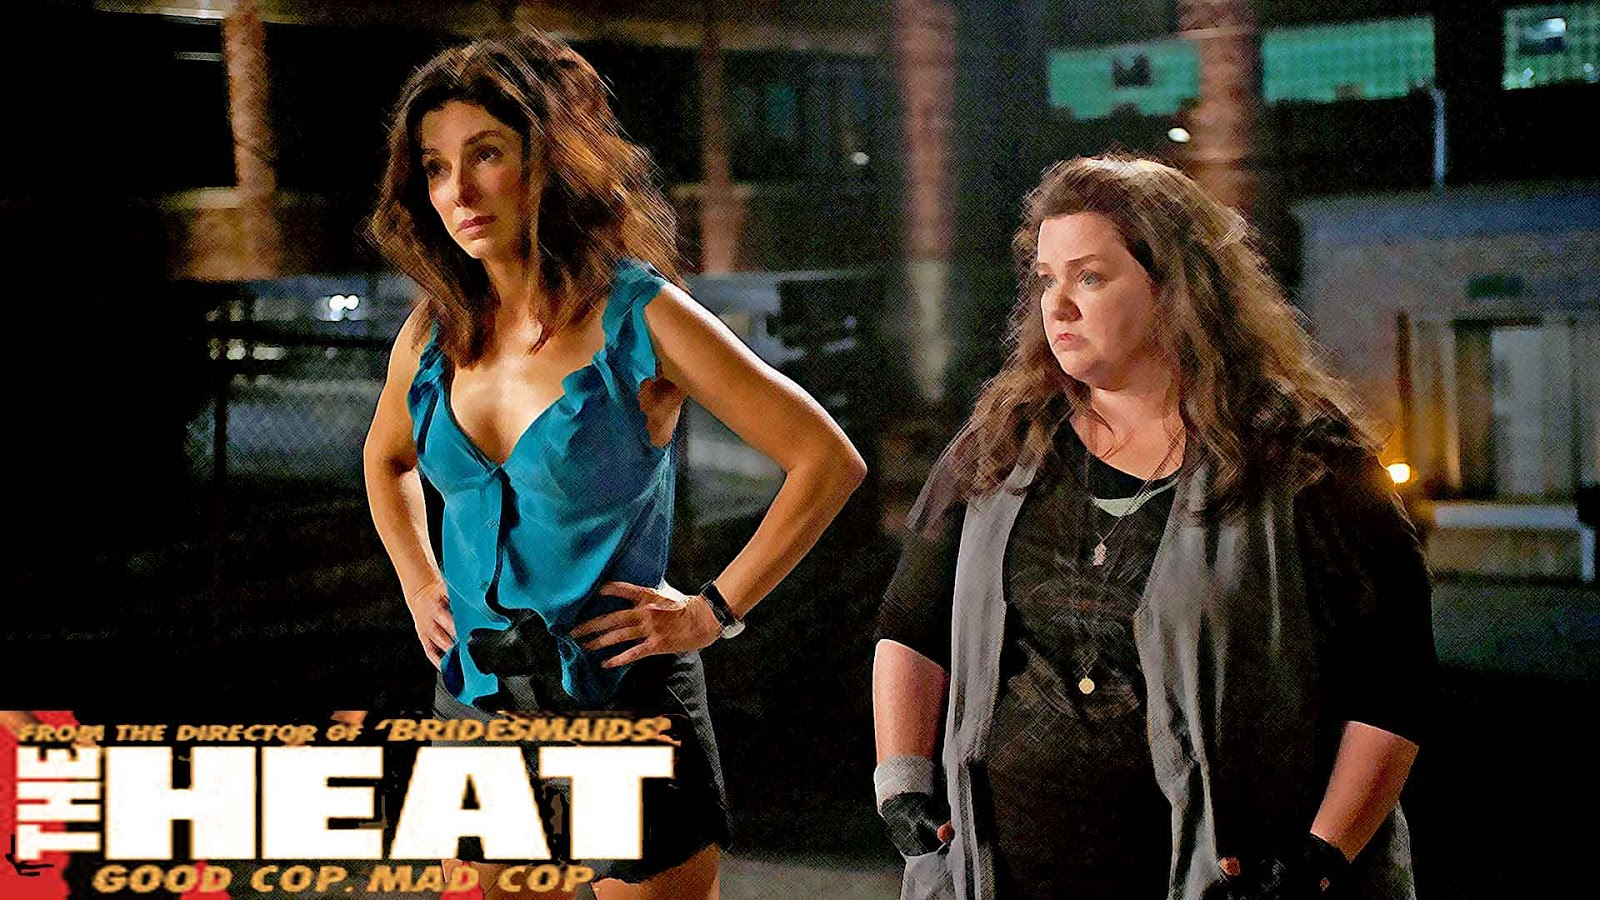 The Heat Movie 2013 Free